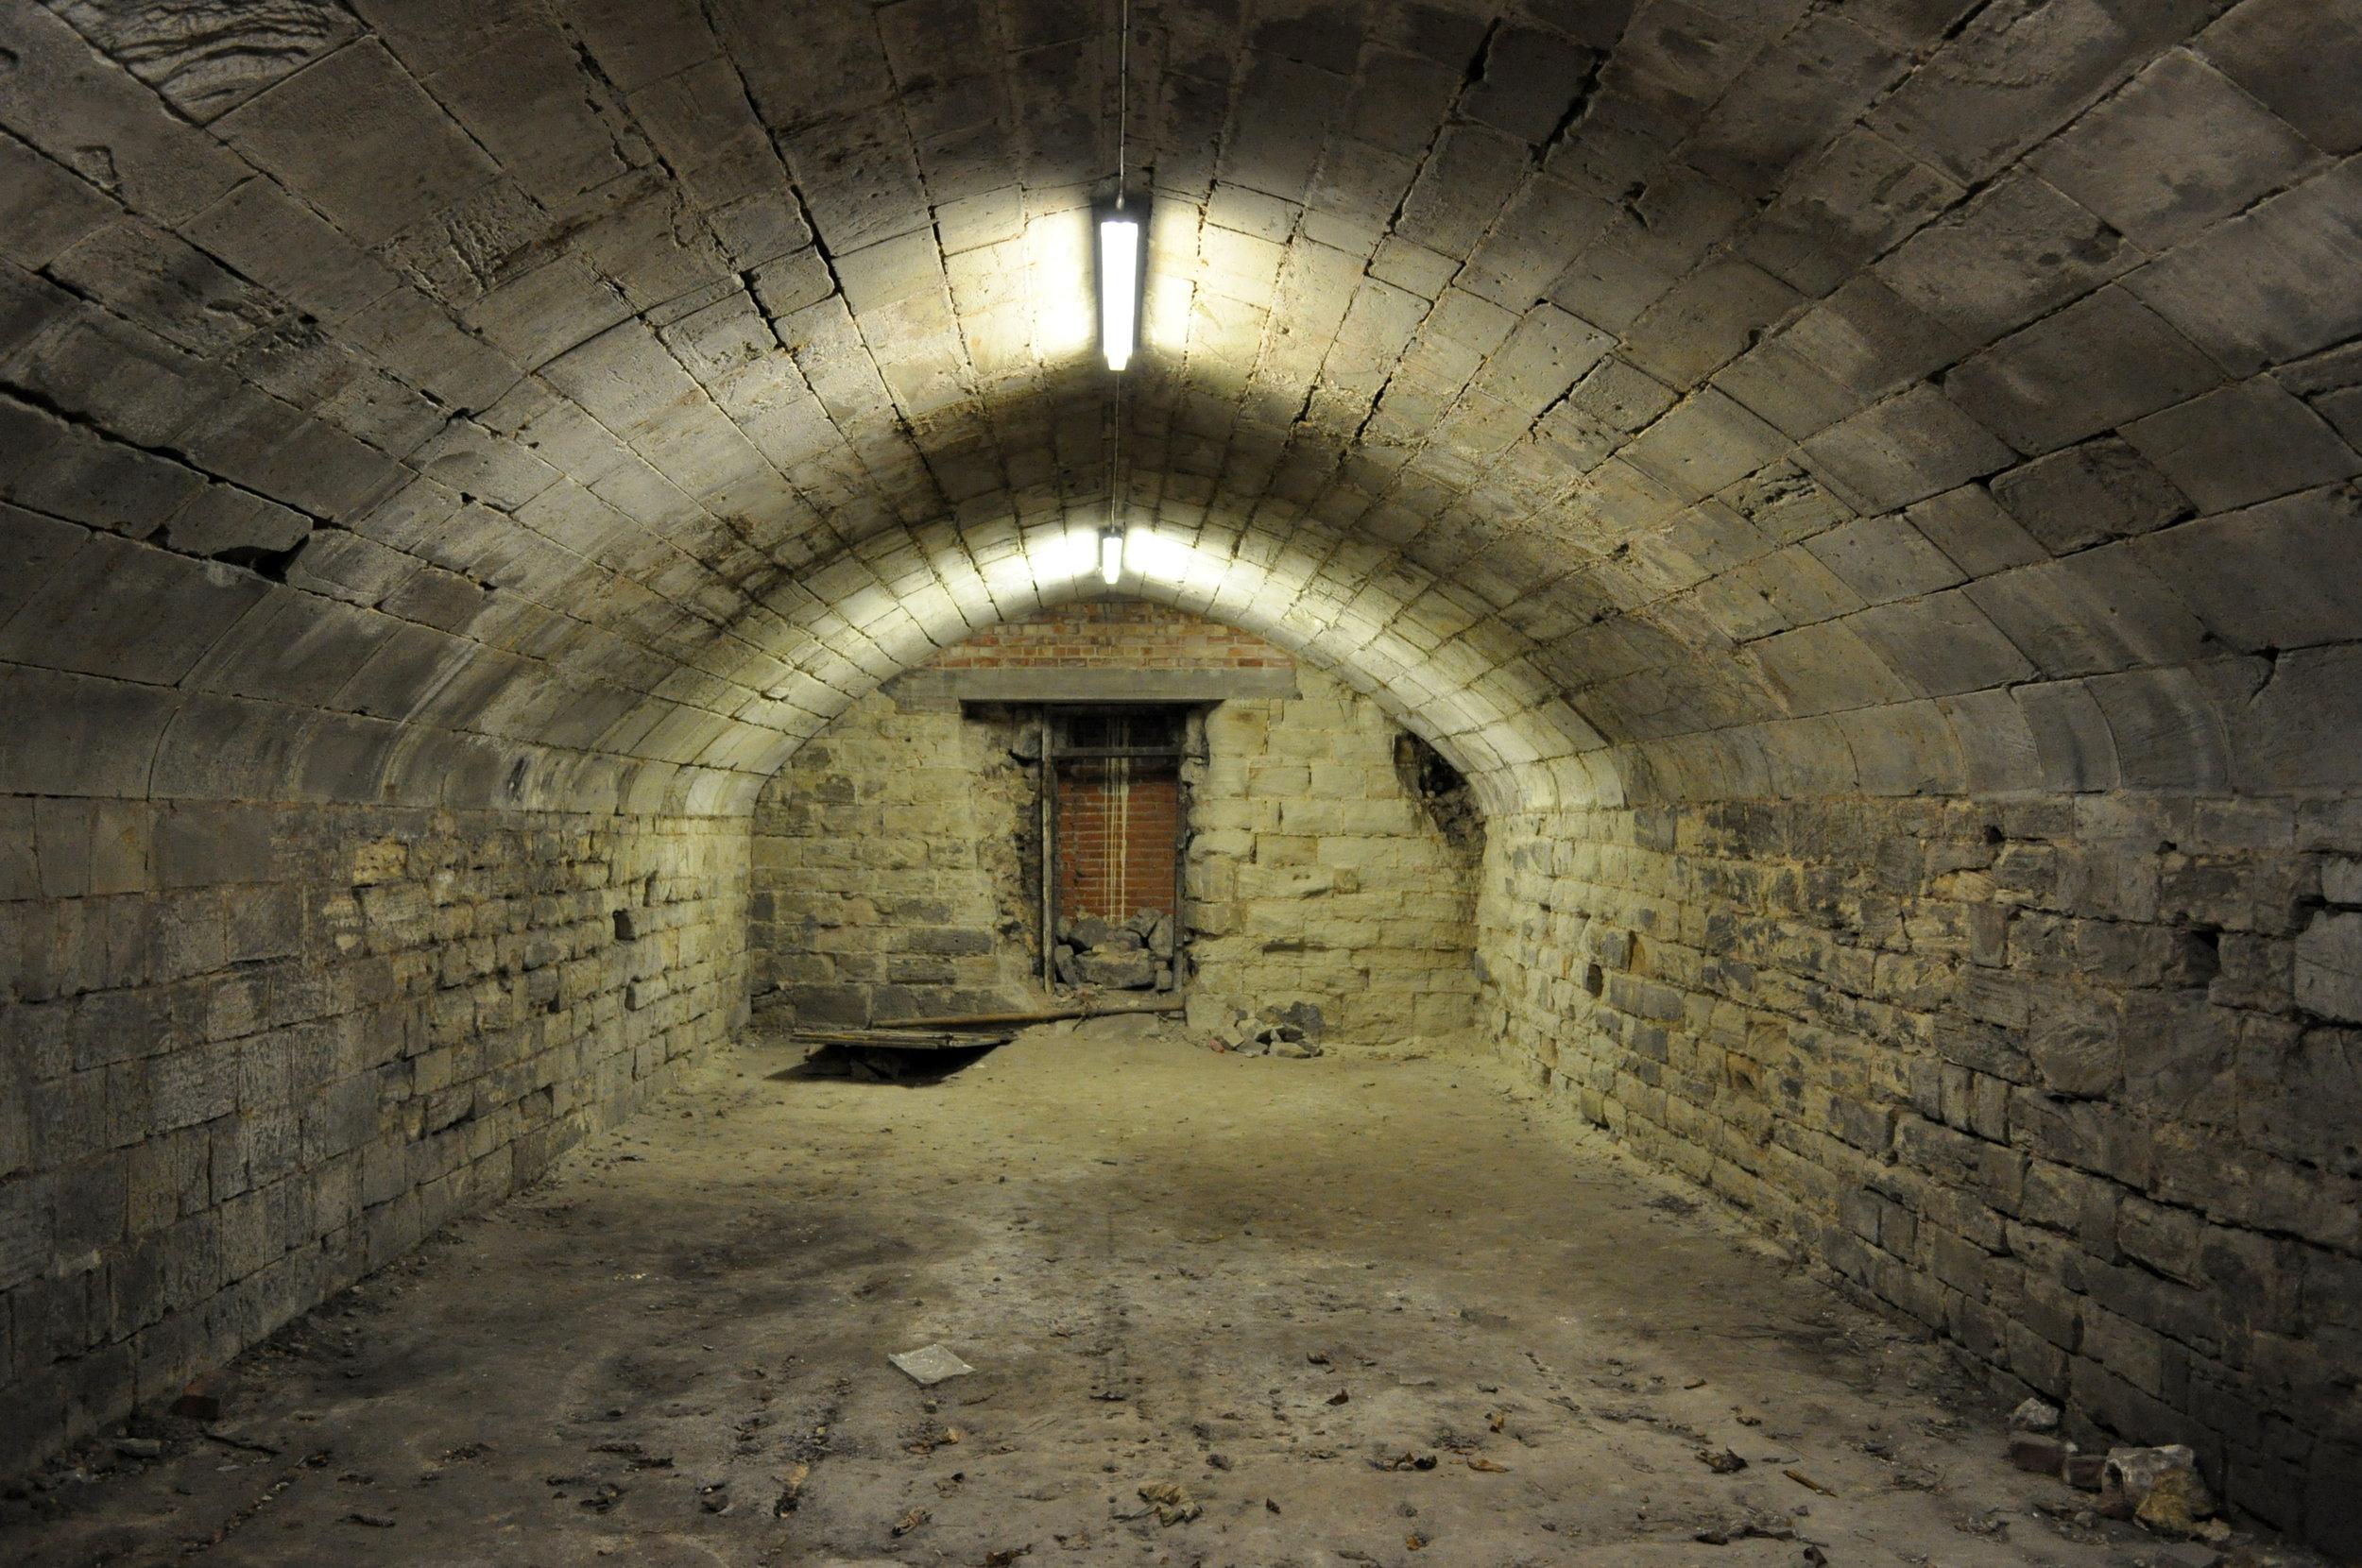 John_o_gaunts_cellar_004.jpg